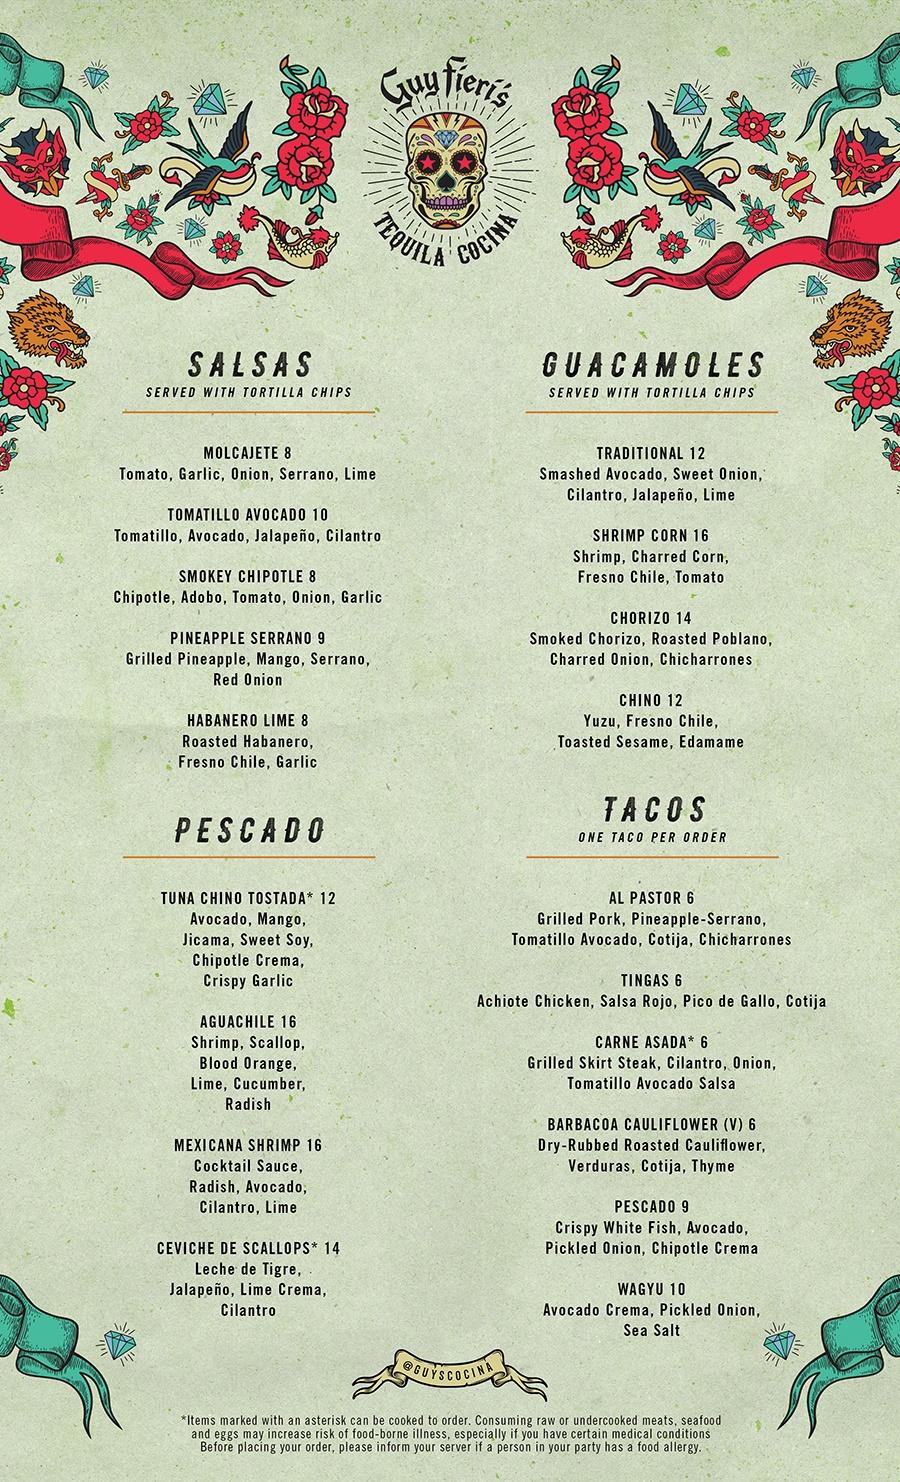 Guy Fieri's Tequila Cocina menu